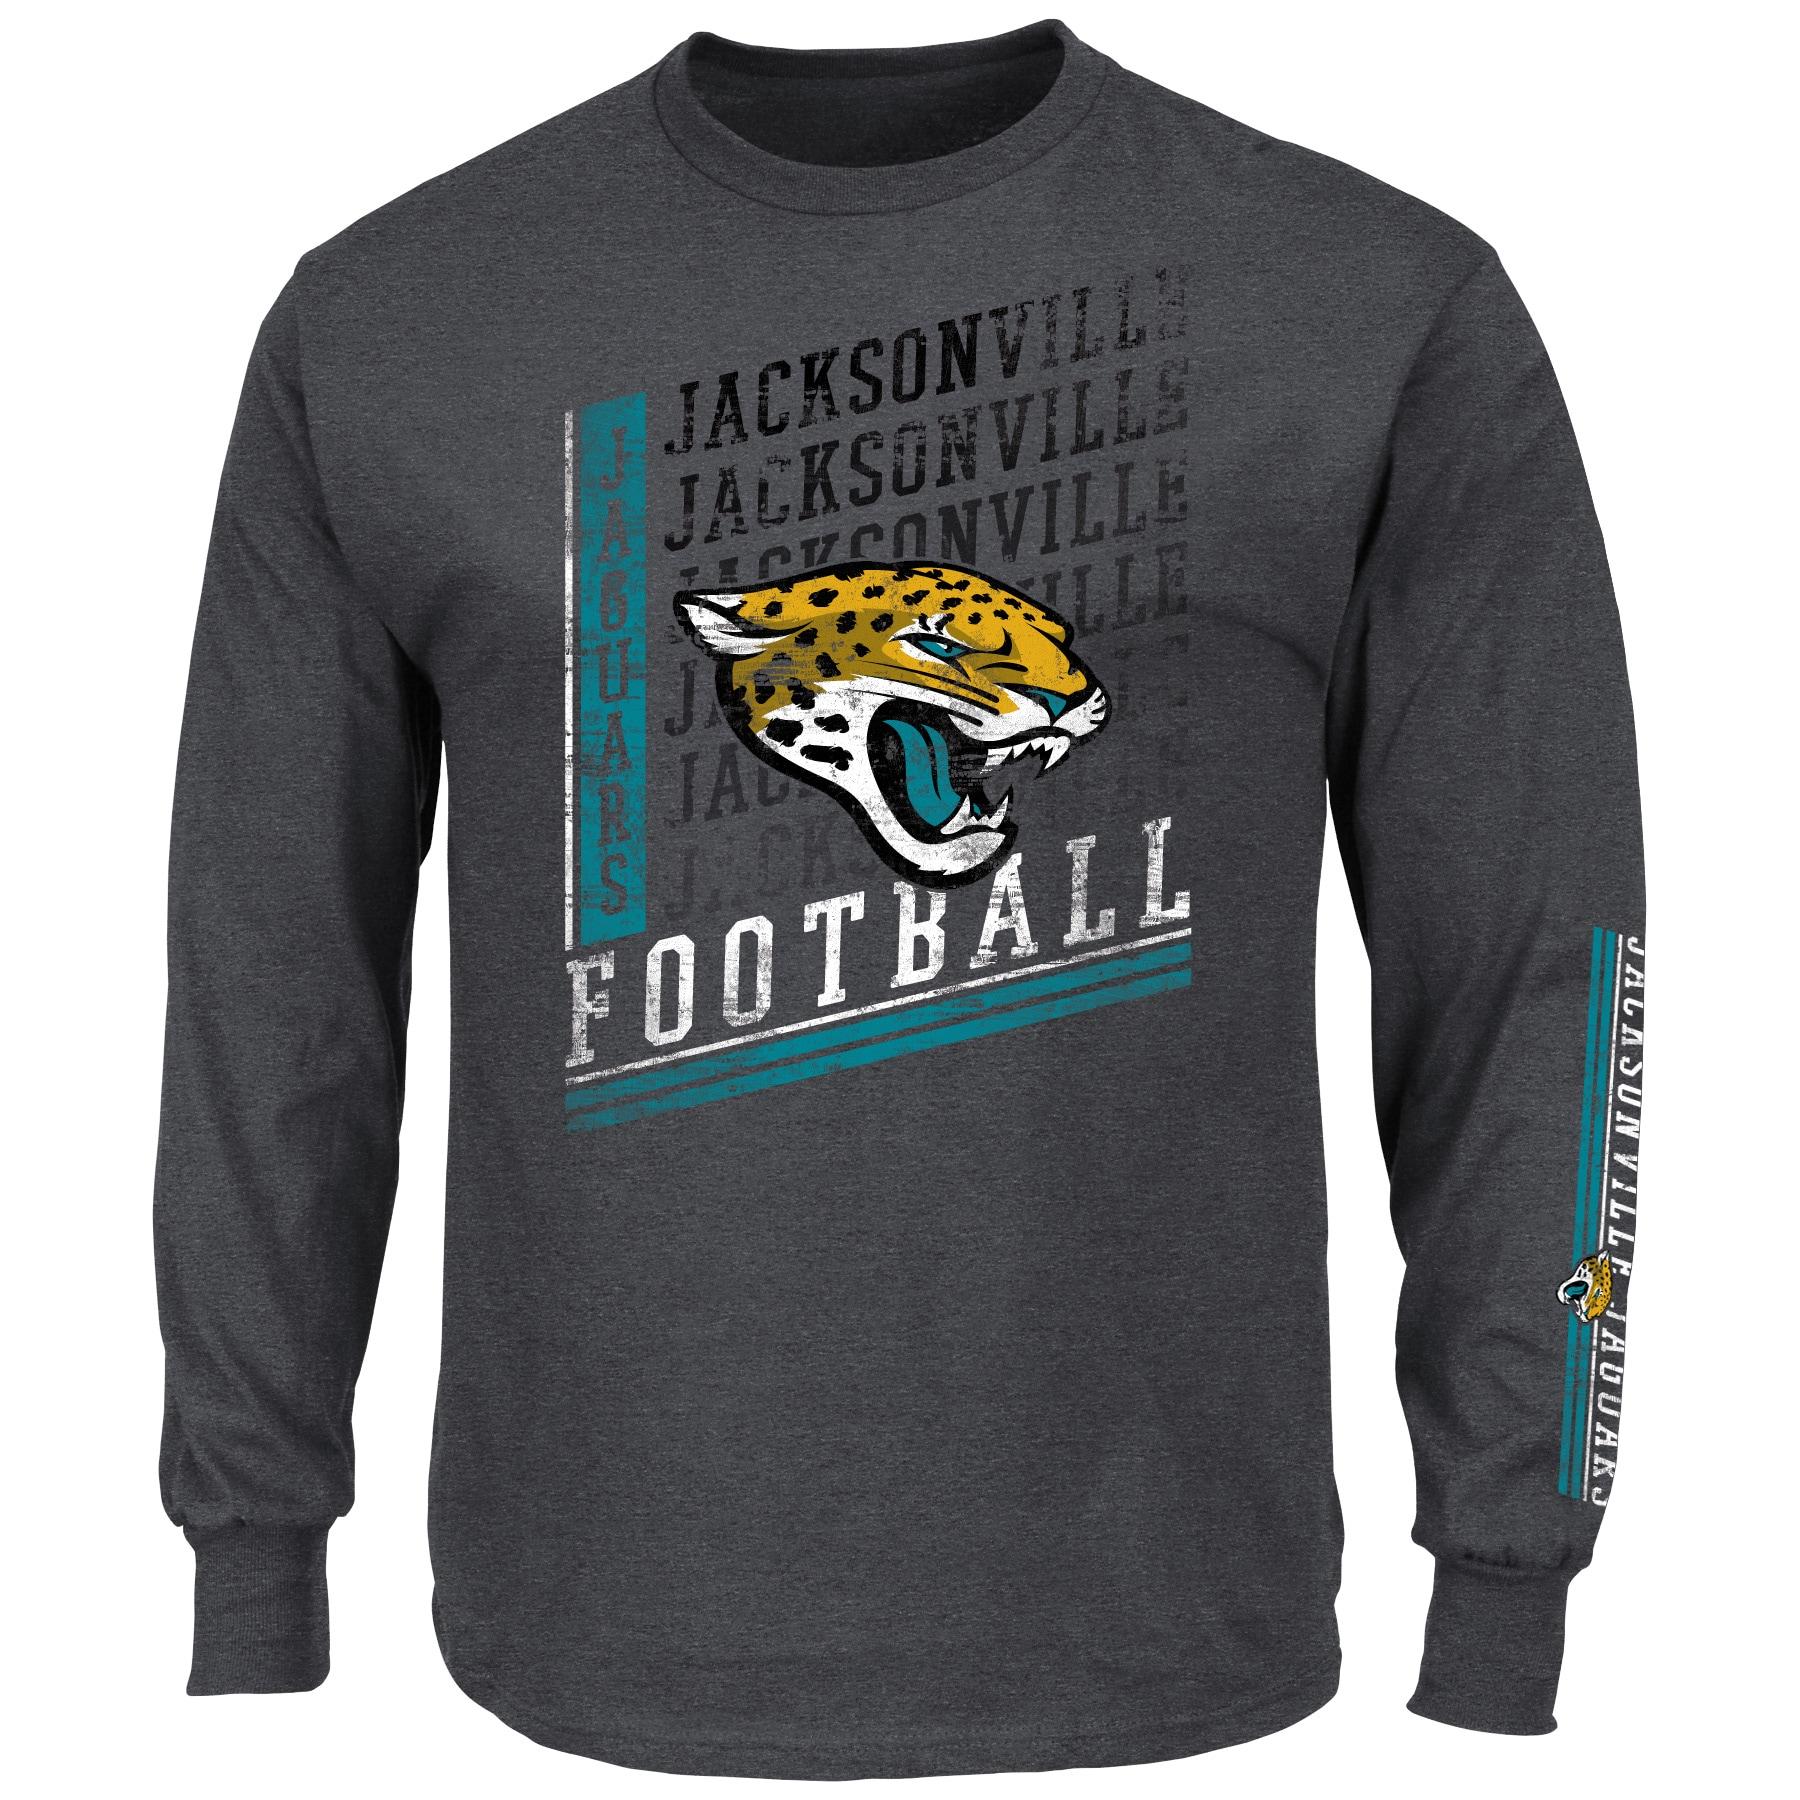 Jacksonville Jaguars Majestic Big & Tall Dual Threat Long Sleeve T-Shirt - Charcoal